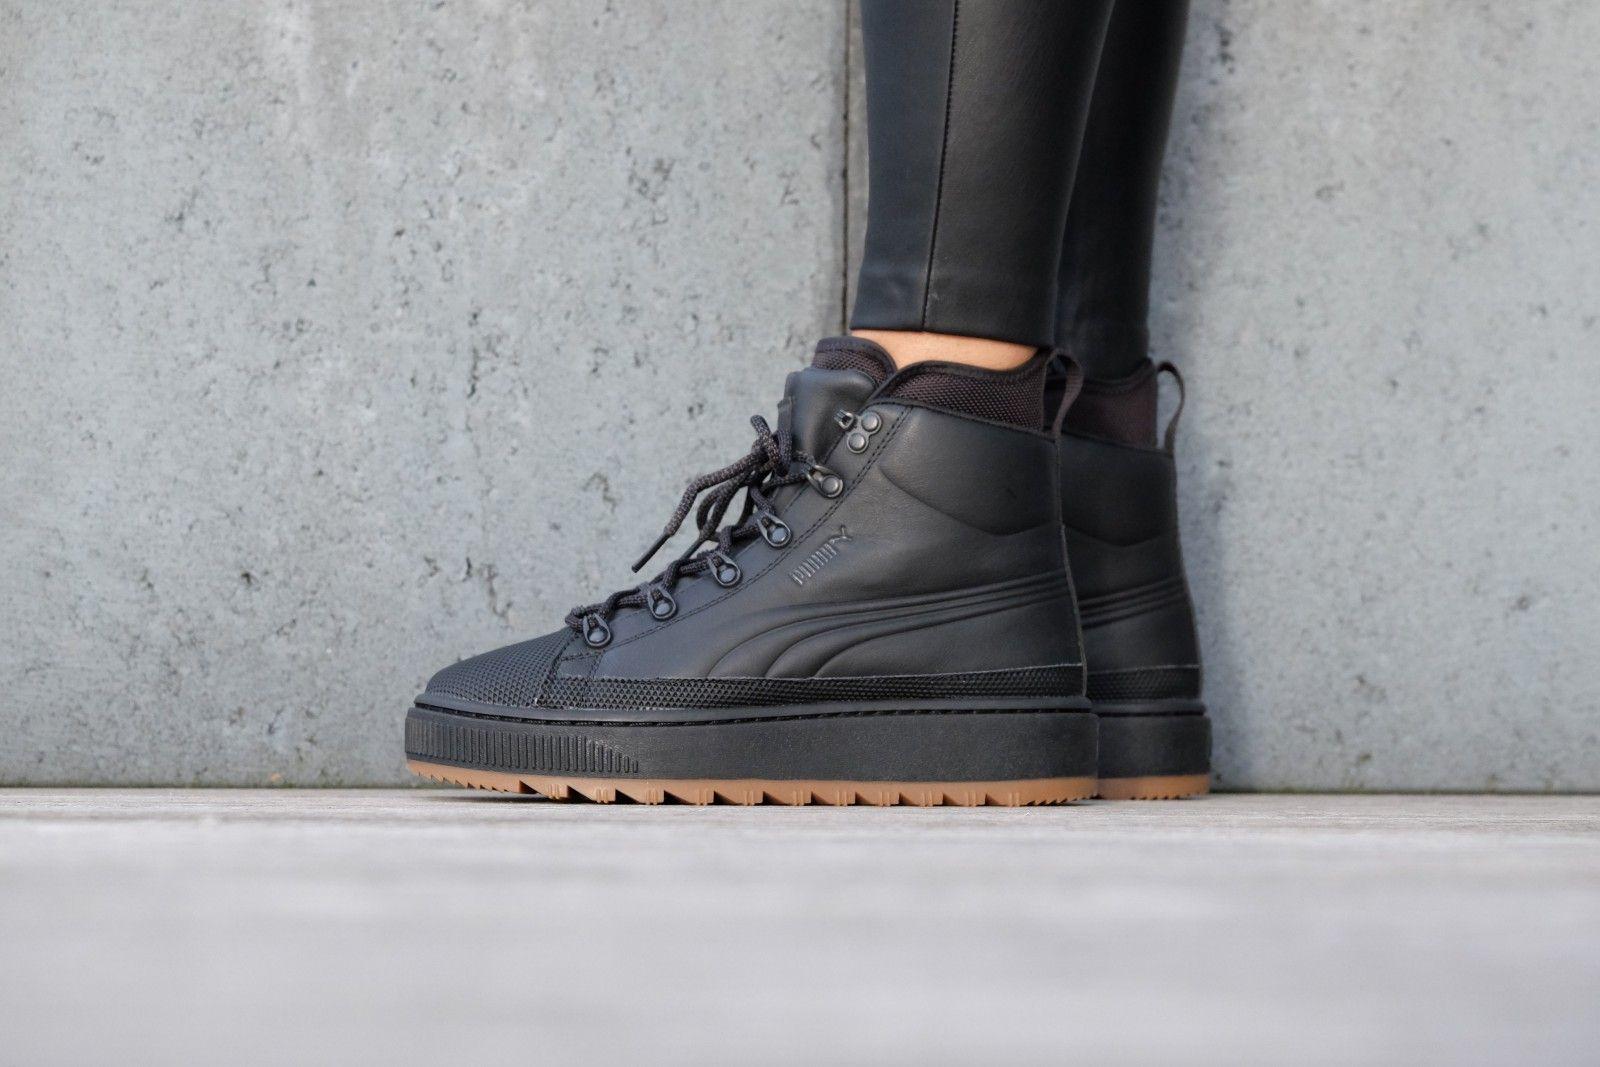 601c6724d87 Puma The Ren Boot - Puma Black - 363366-01